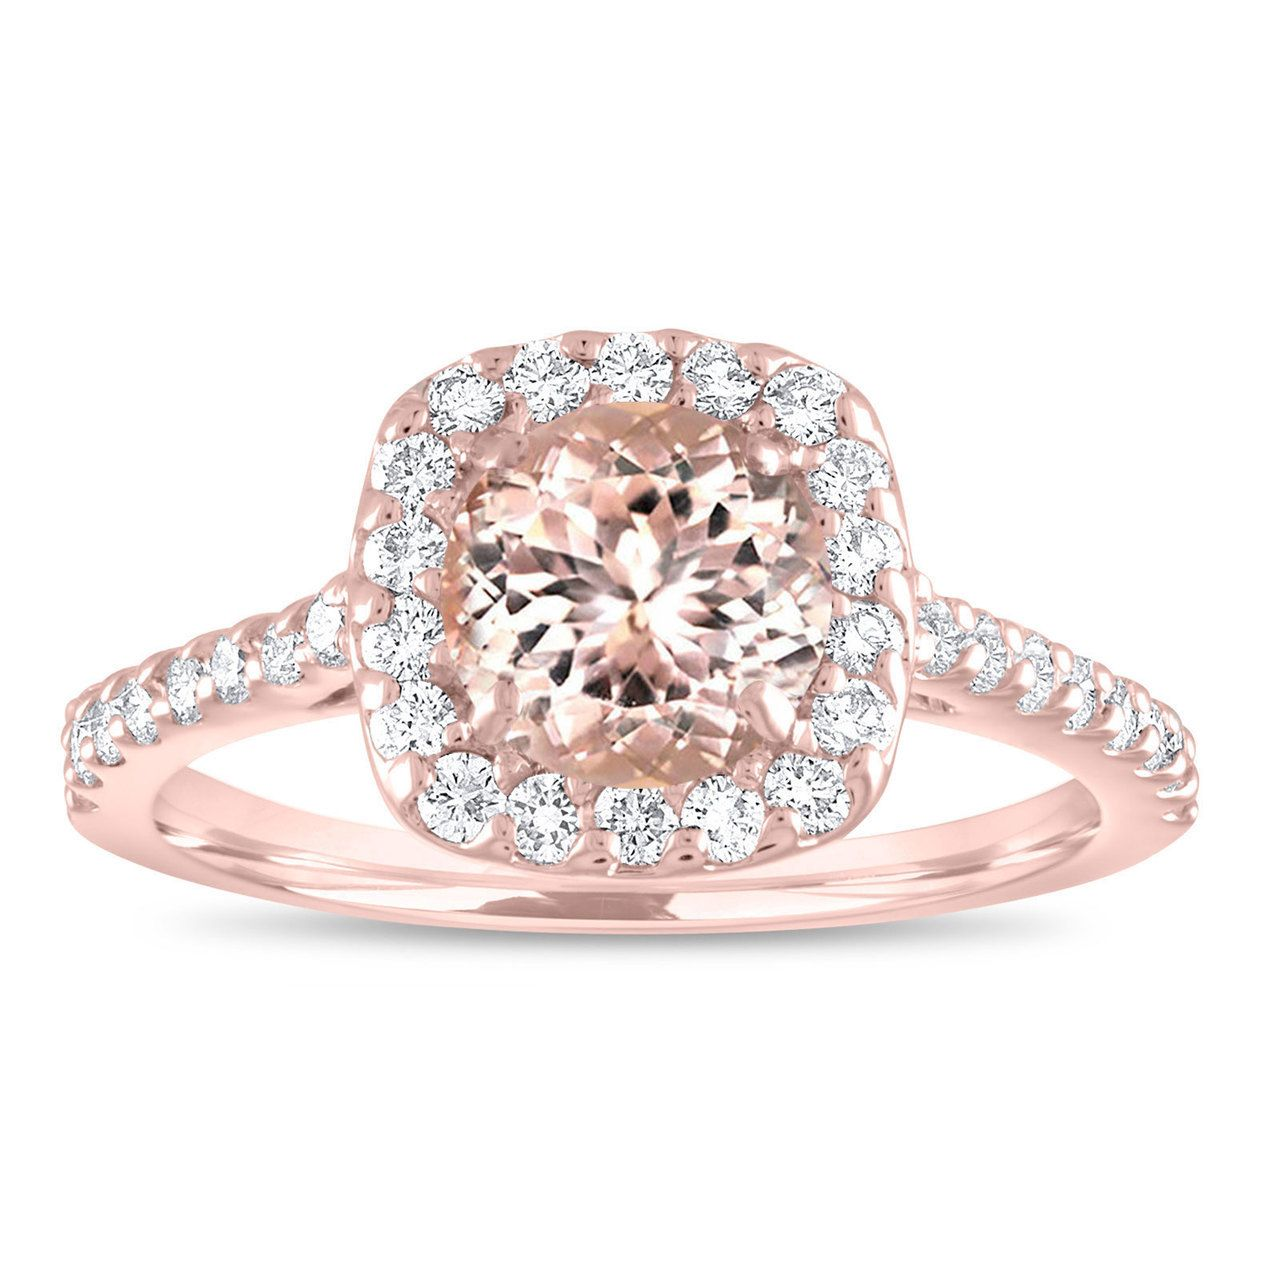 Photo of Morganite Engagement Ring Rose Gold, Pink Morganite Cushion Cut Bridal Ring, Peach Morganite Wedding Ring 1.47 Carat Certified Pave Handmade